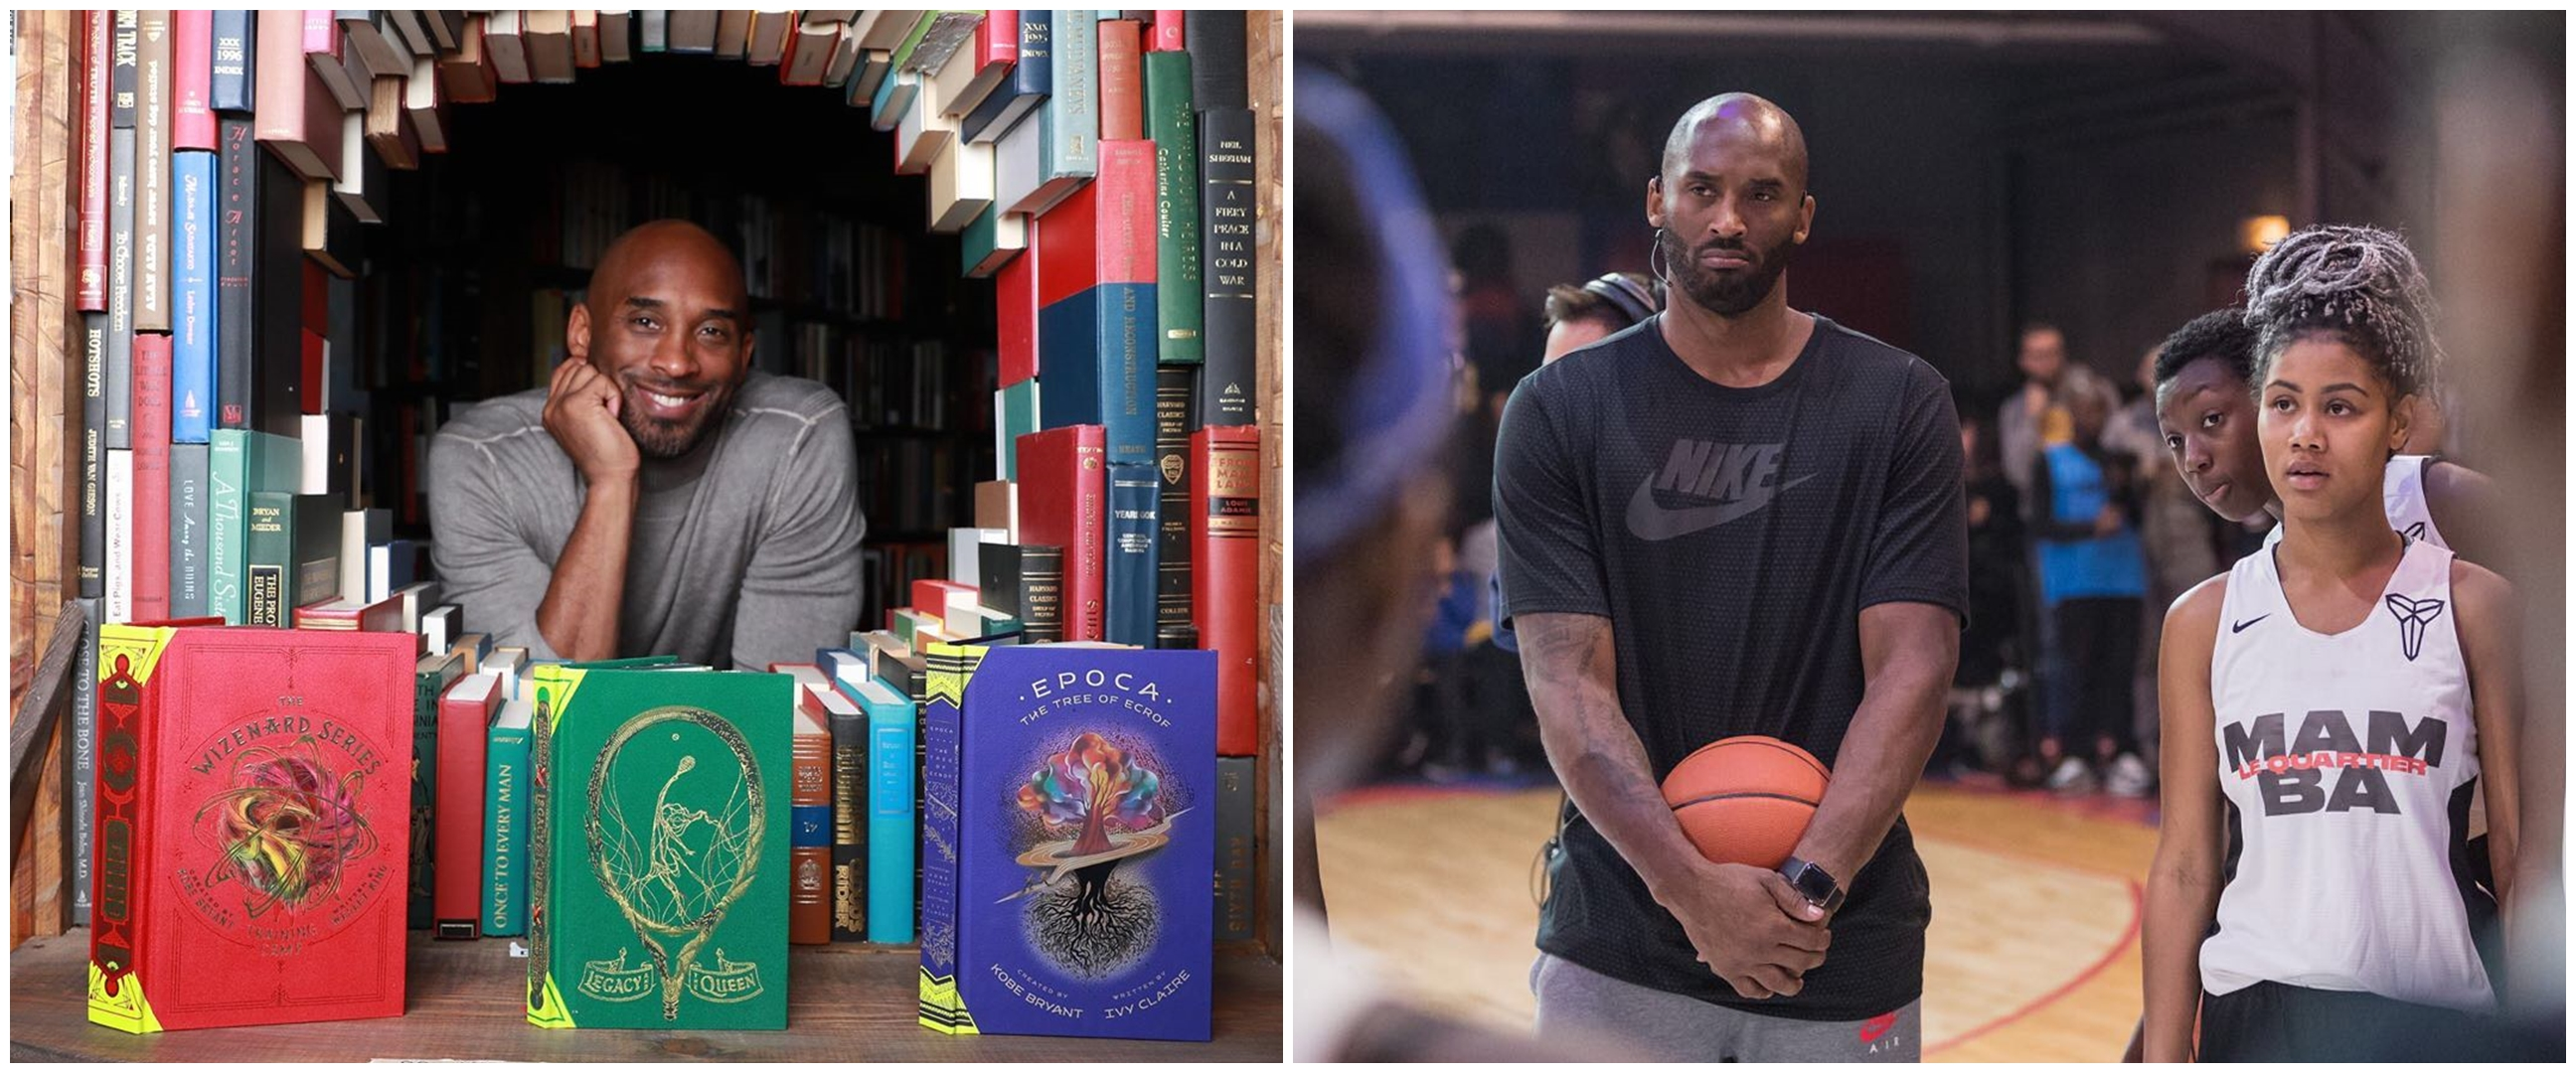 20 Kata-kata inspiratif mendiang Kobe Bryant, penuh motivasi